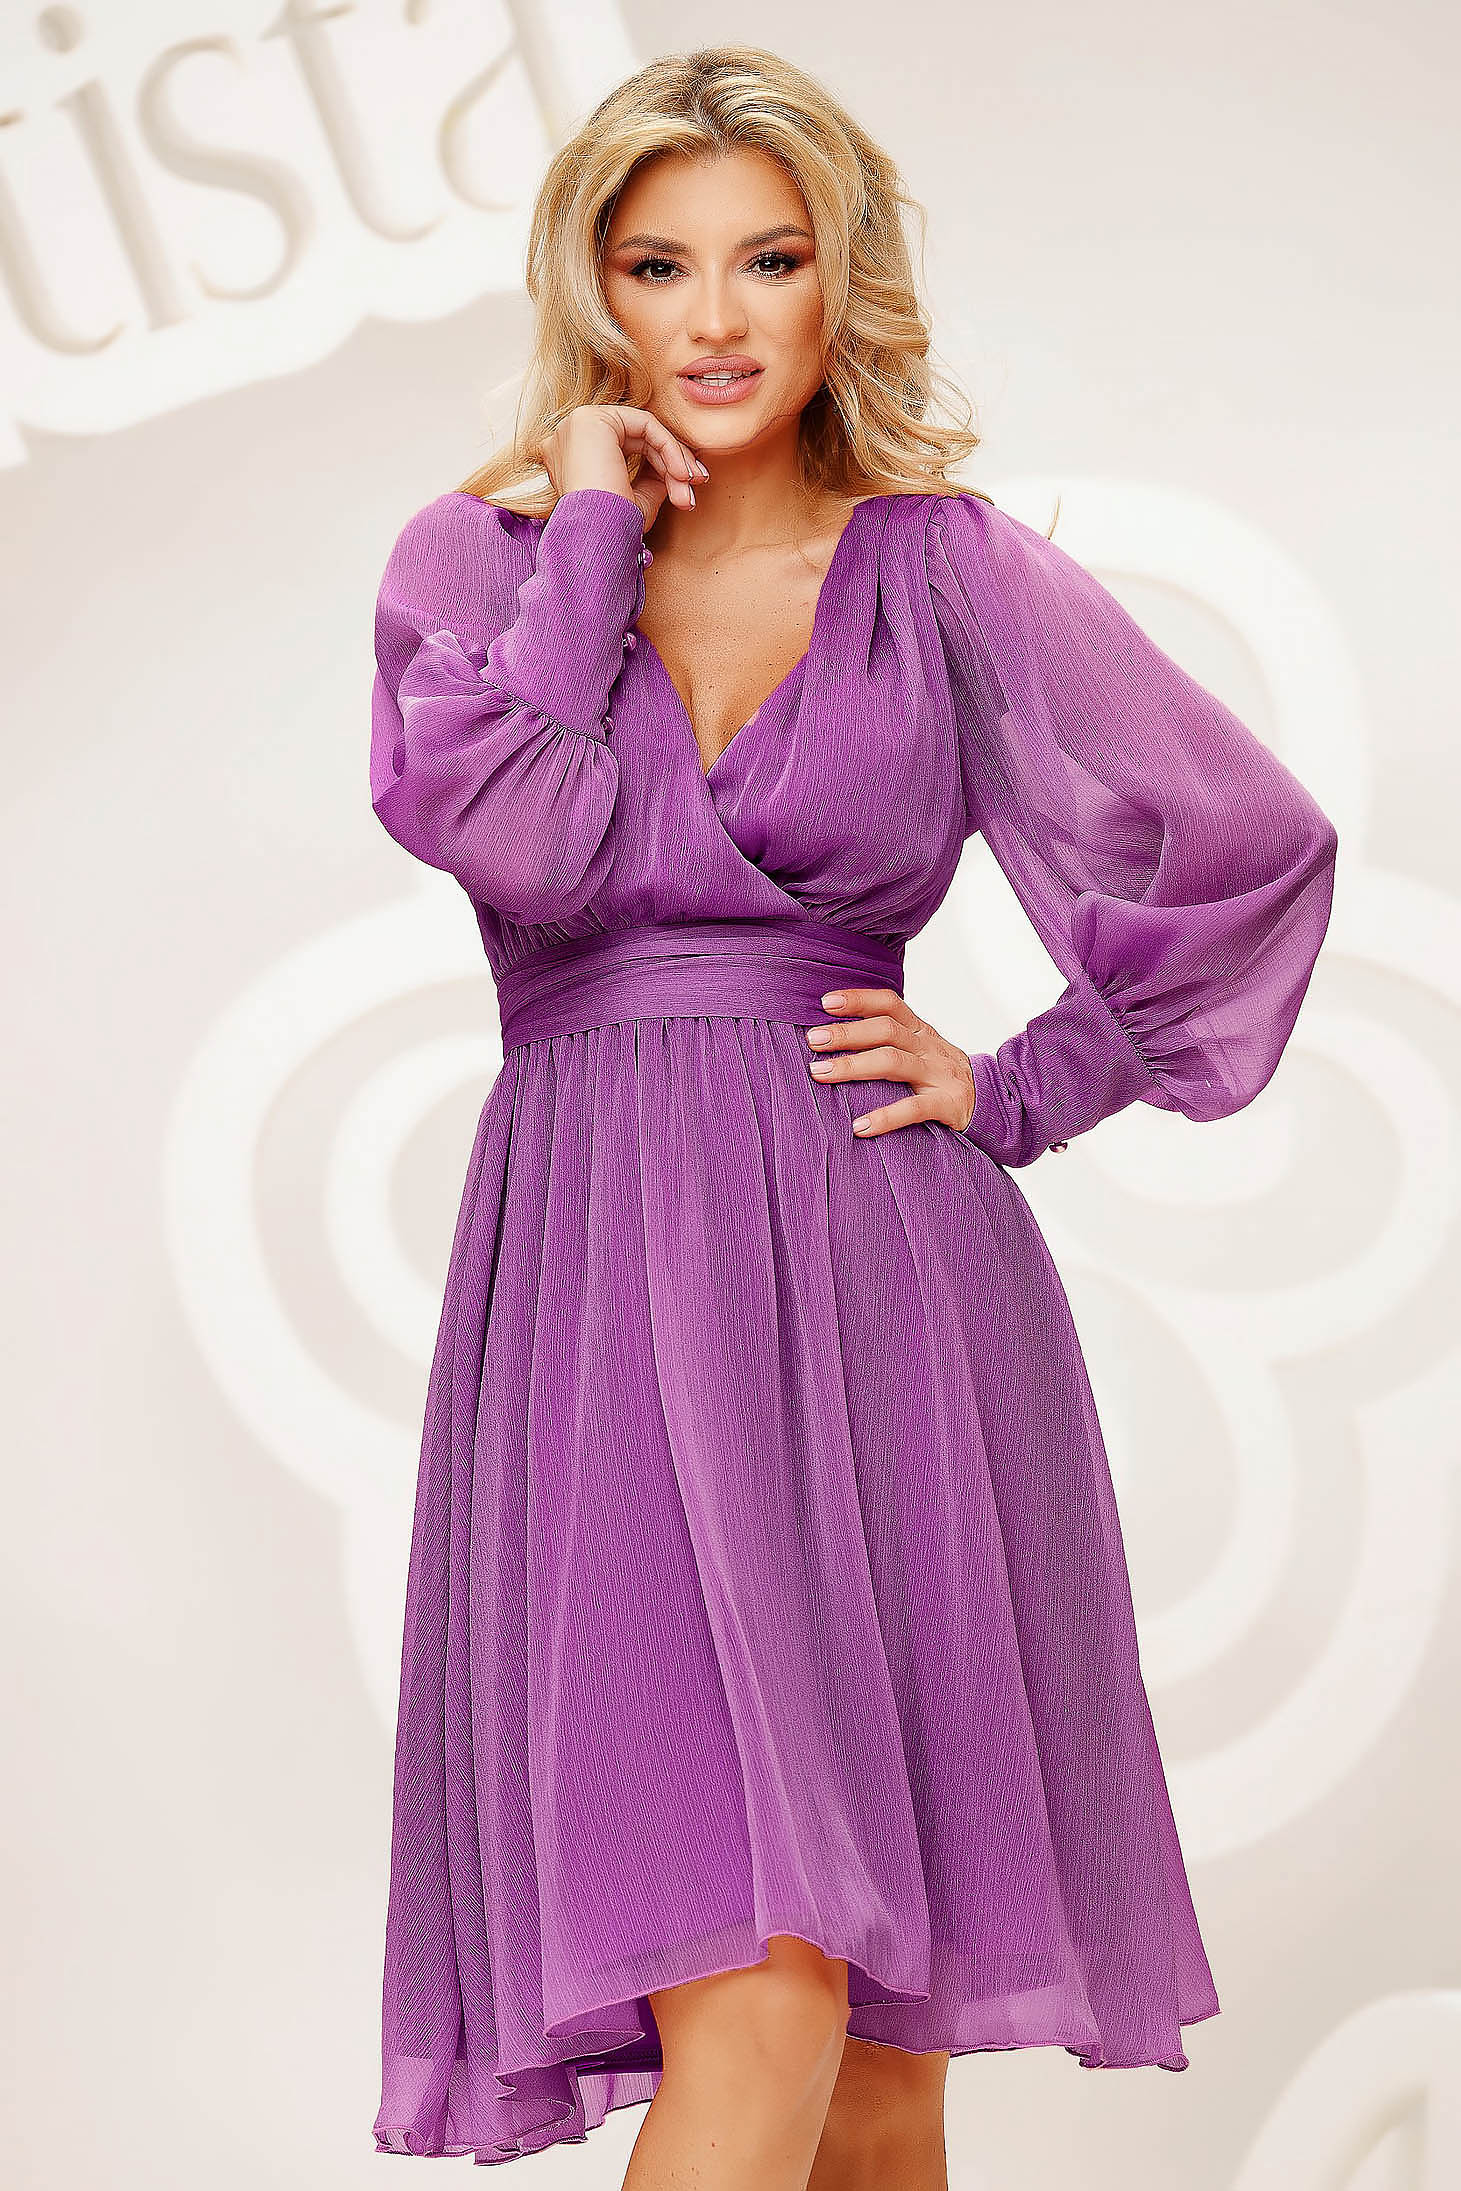 Lightpurple dress cloche midi occasional light material from veil fabric wrinkled texture slightly elastic fabric